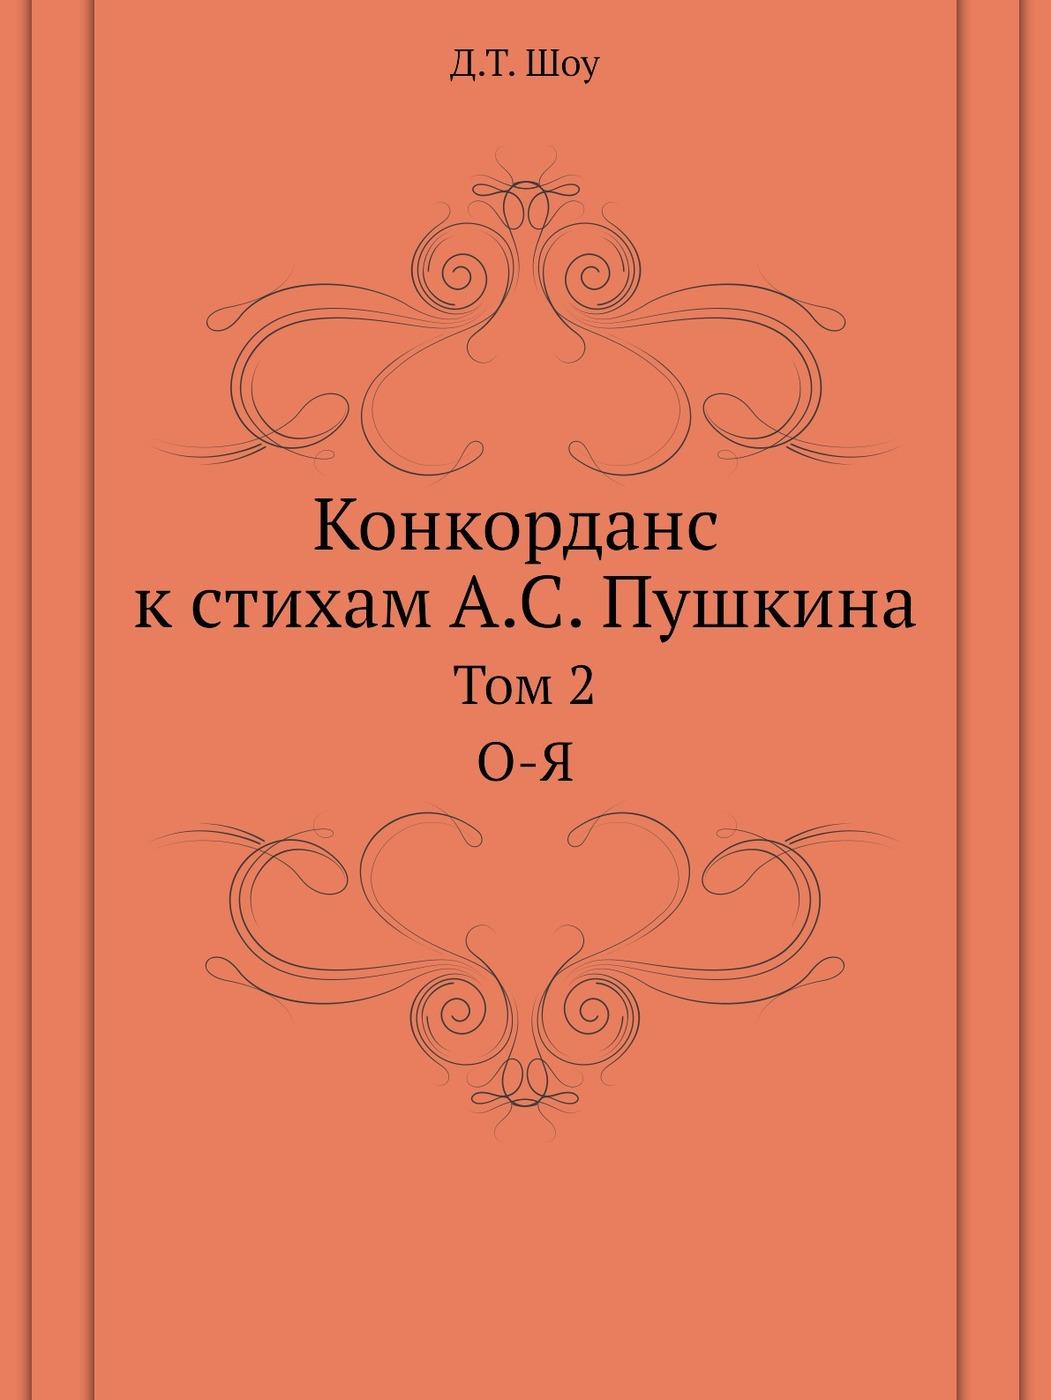 Д.Т. Шоу Конкорданс к стихам А. С. Пушкина. Том 2. О-Я